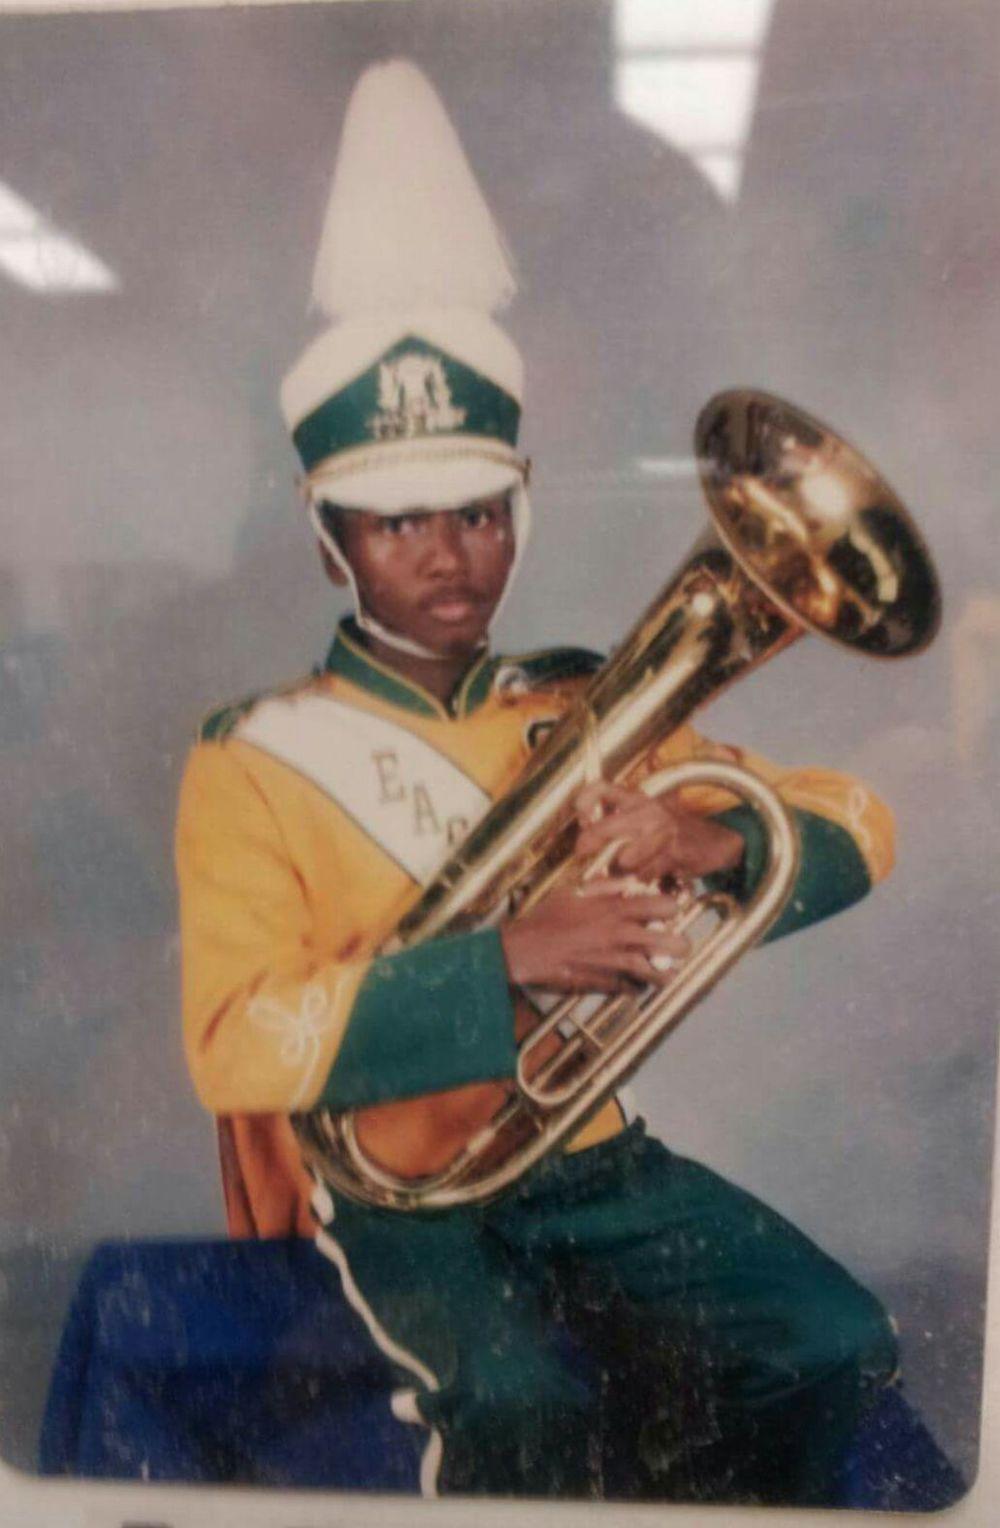 Music Professor vs High School Band Director?